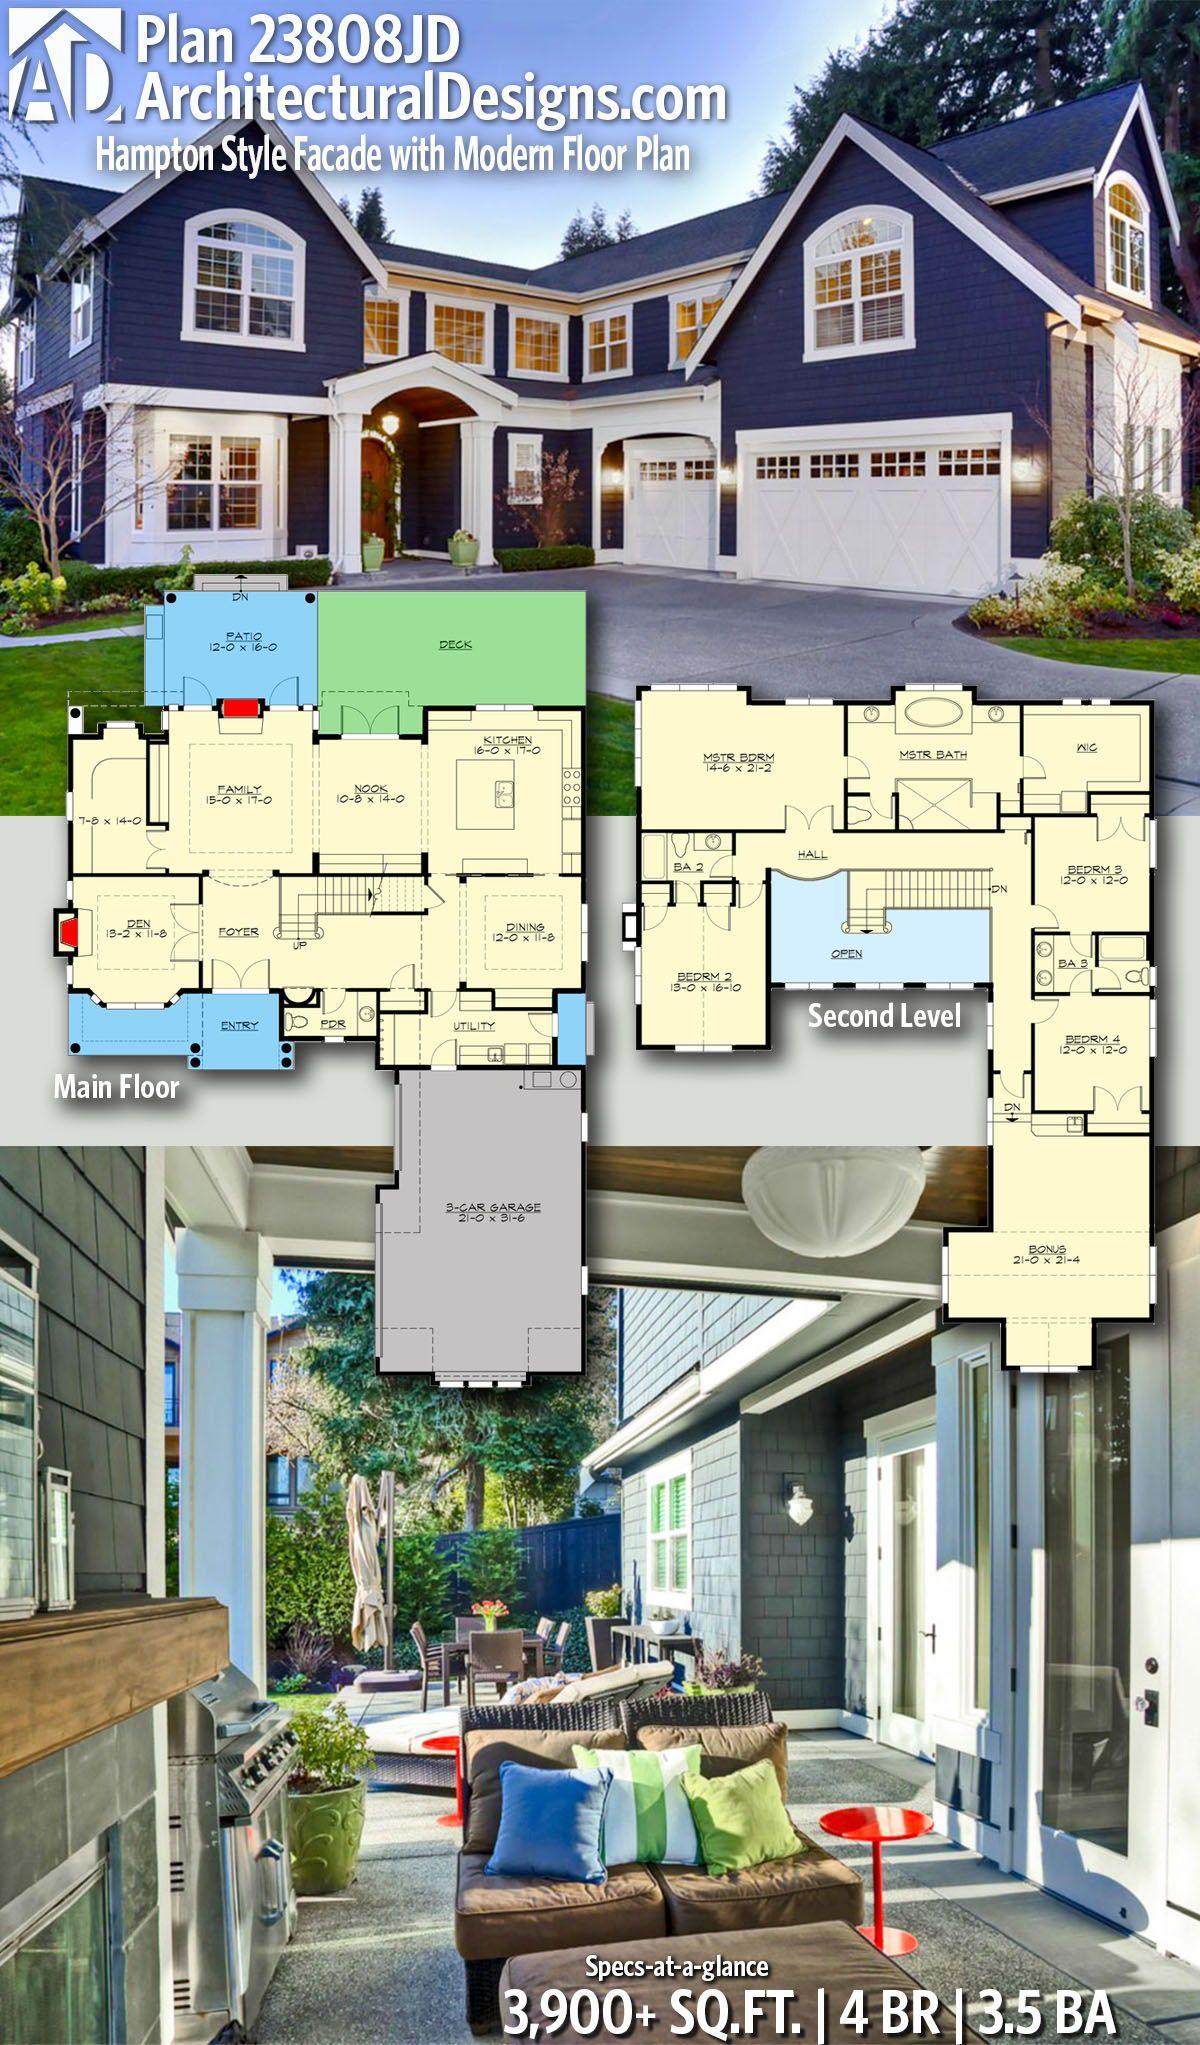 Plan 23808jd Hampton Style Facade With Modern Floor Plan Architectural Design House Plans Modern Floor Plans Dream House Plans